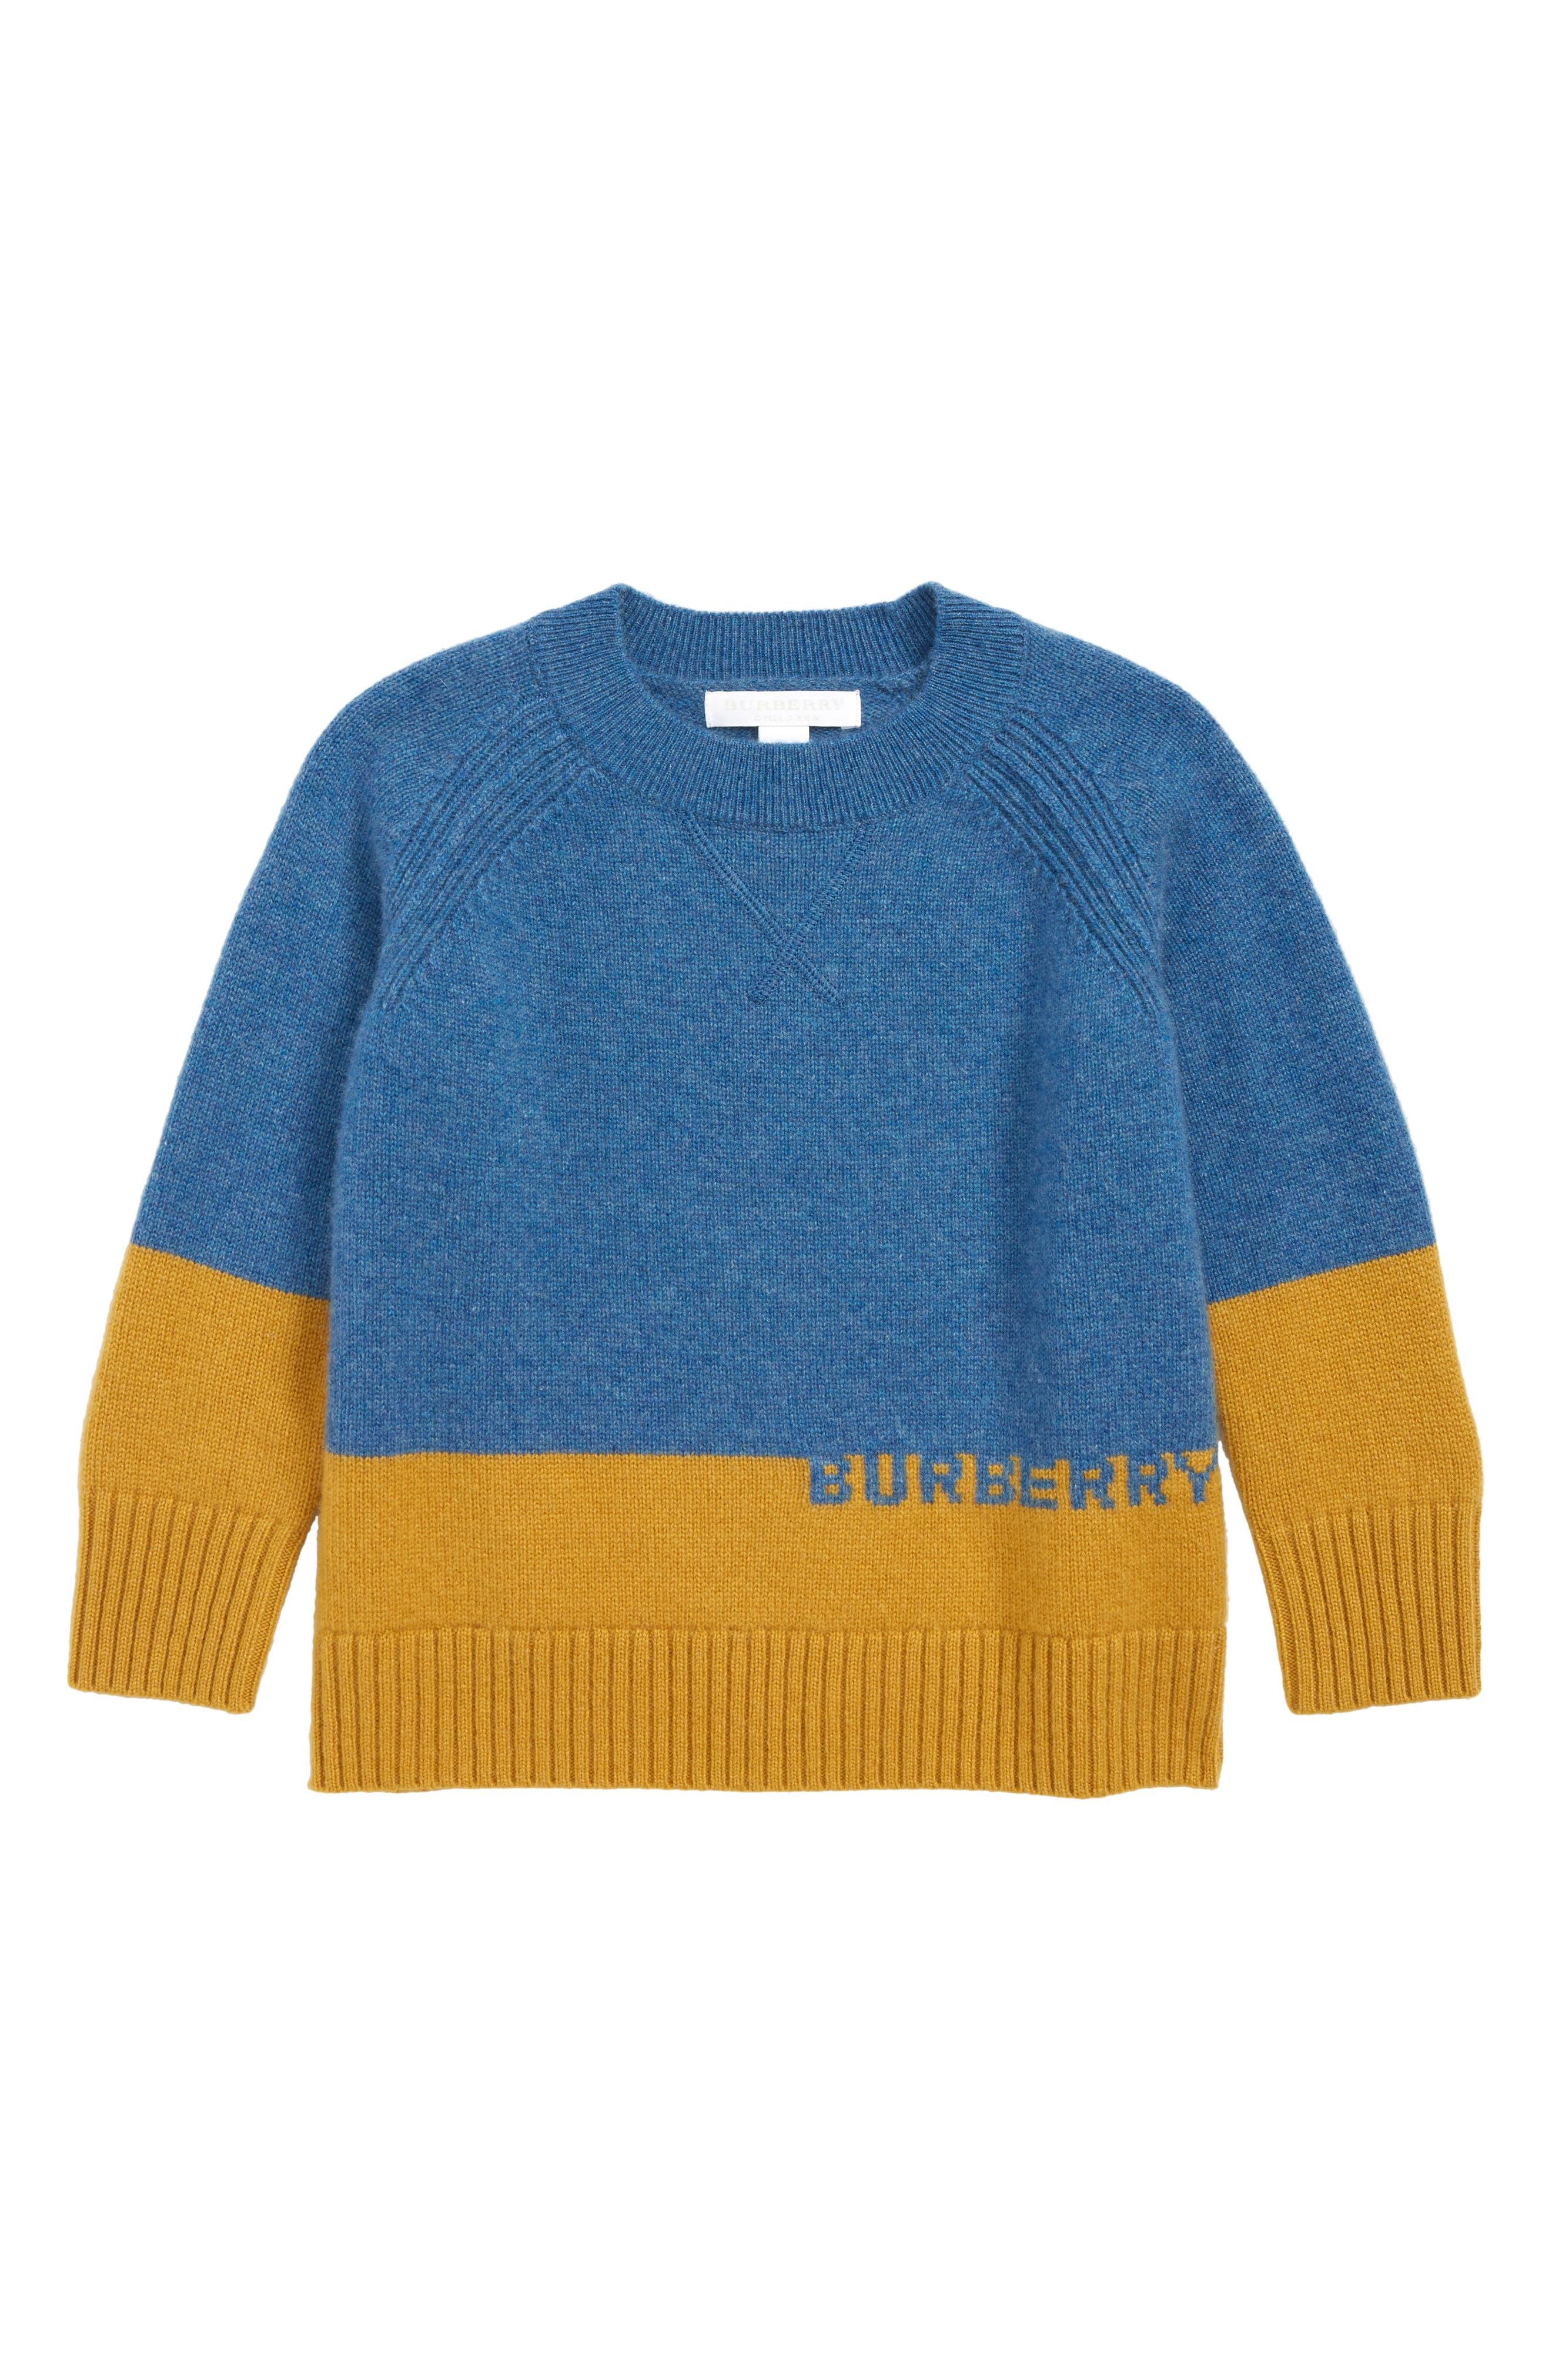 Alister Cashmere Sweater,                         Main,                         color, DUSTY BLUE MELANGE